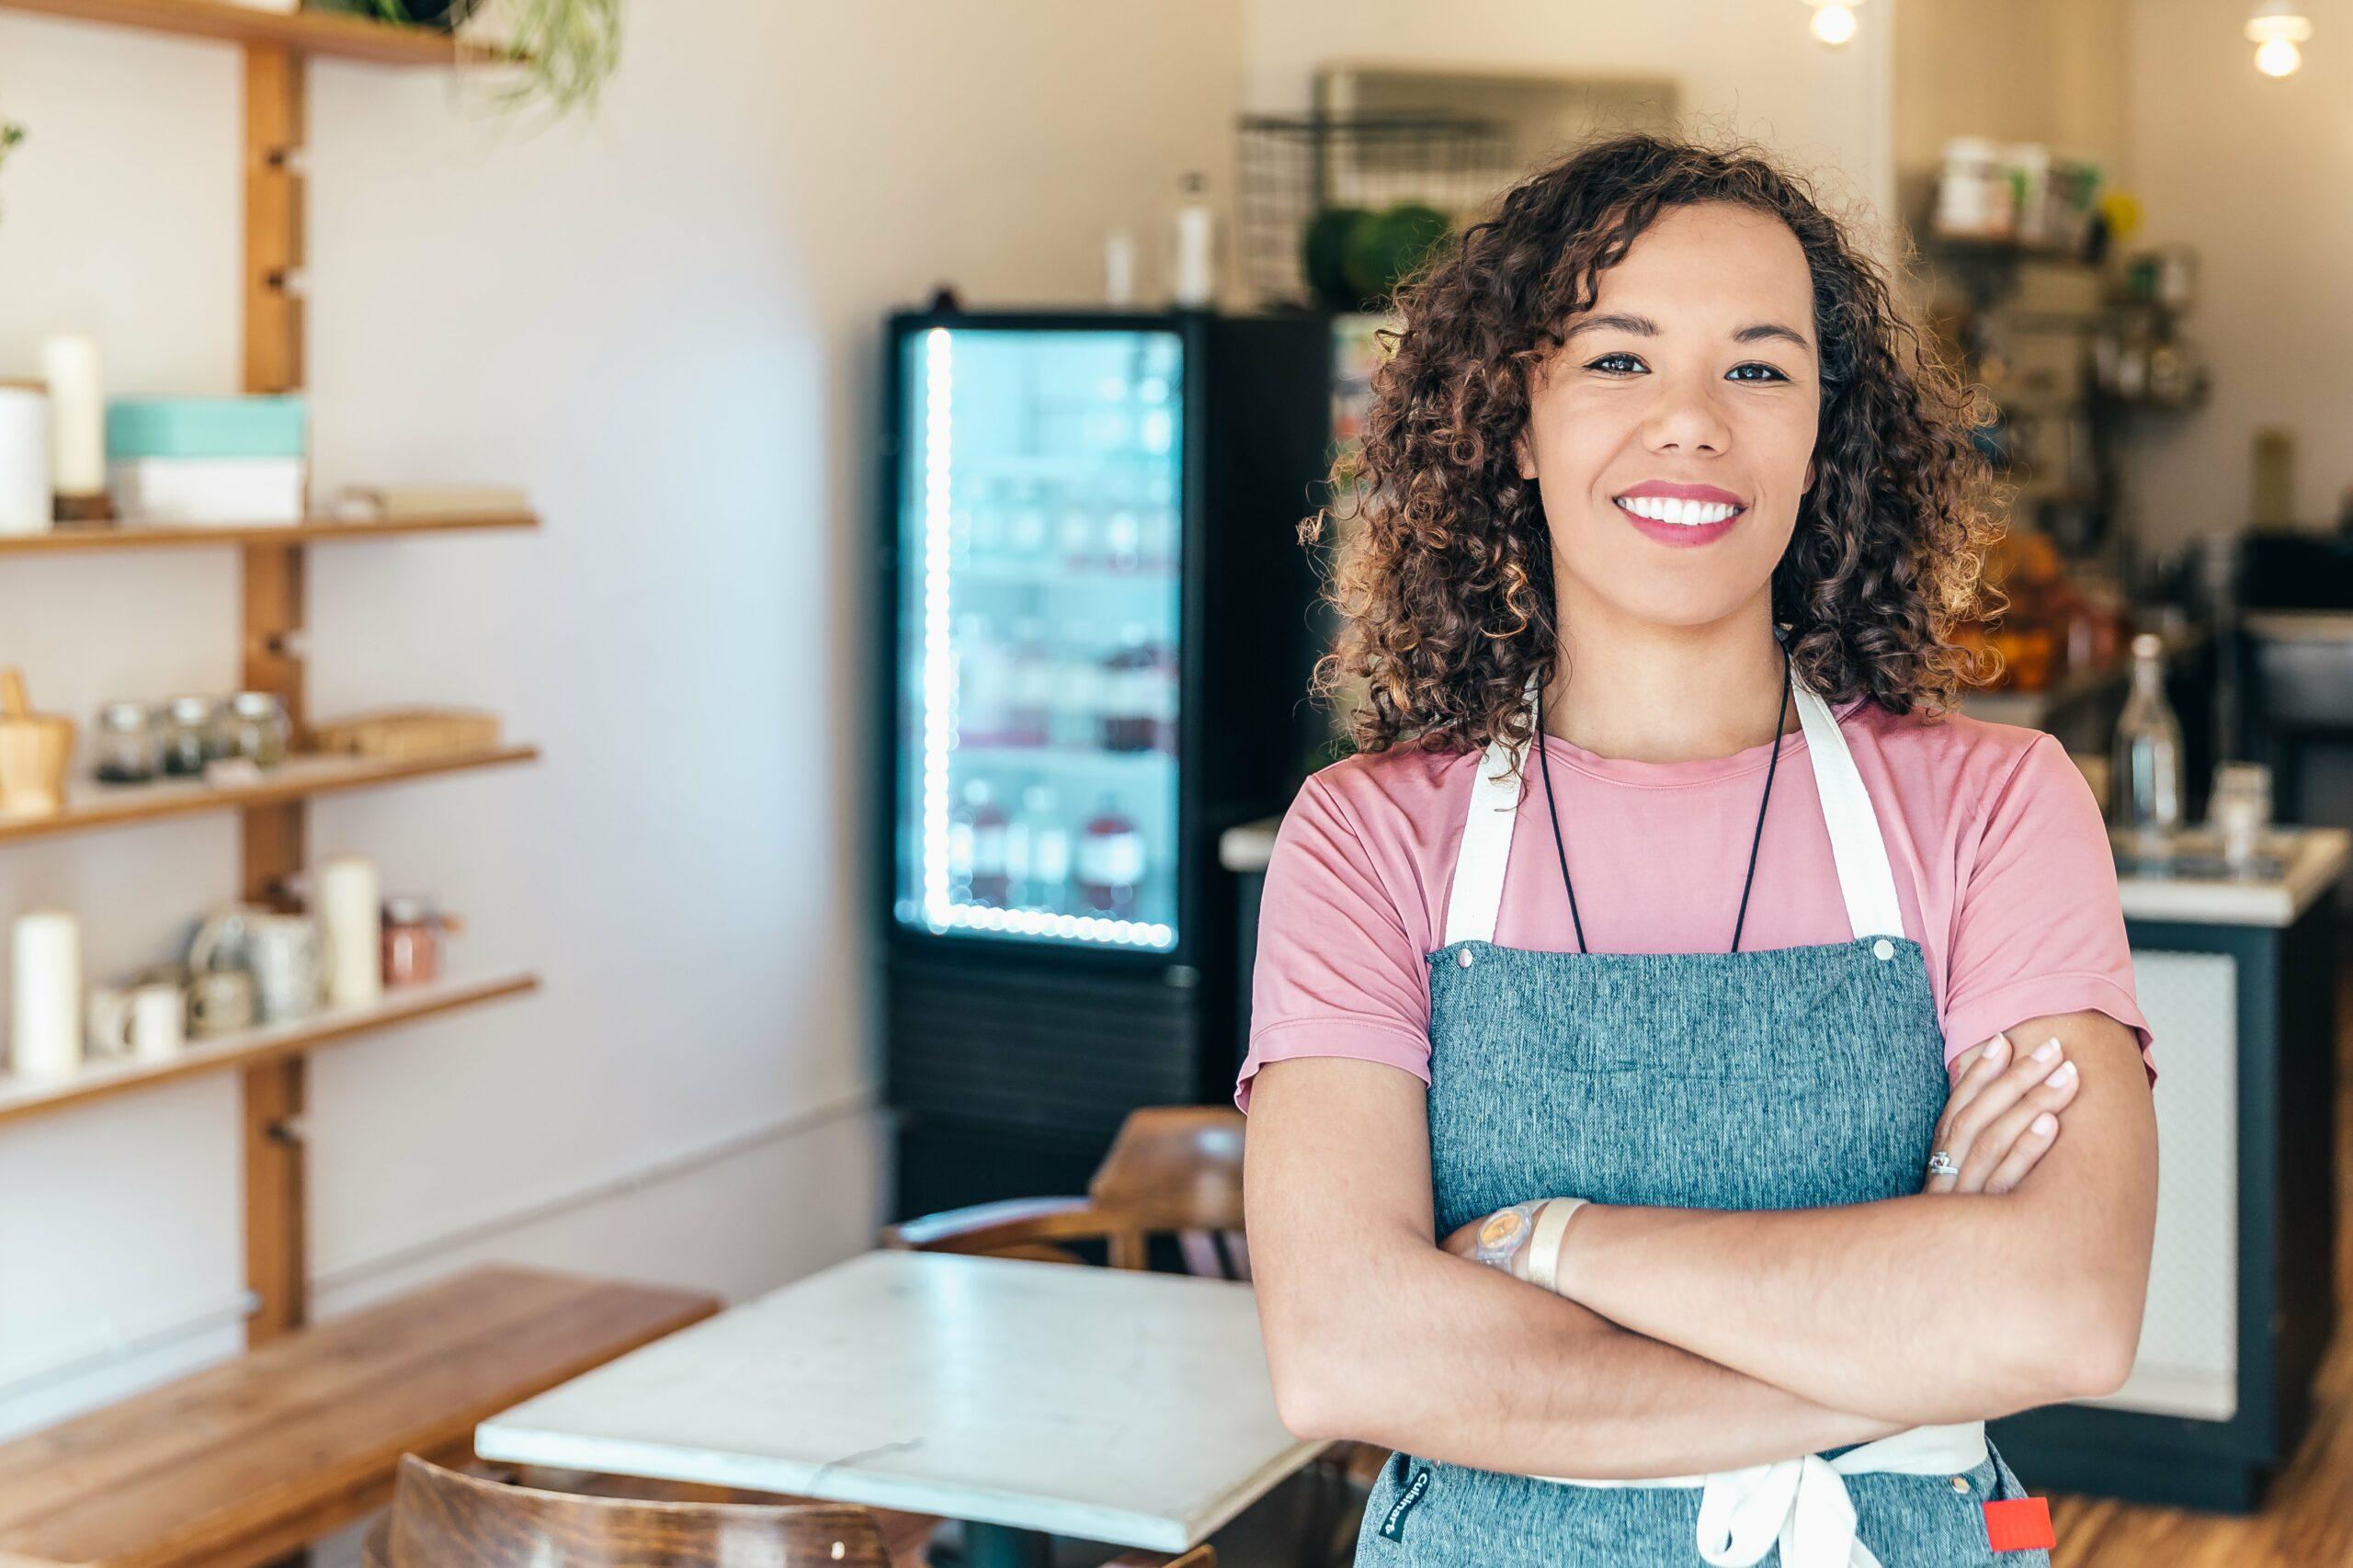 Canadian entrepreneur in a cafe smiling